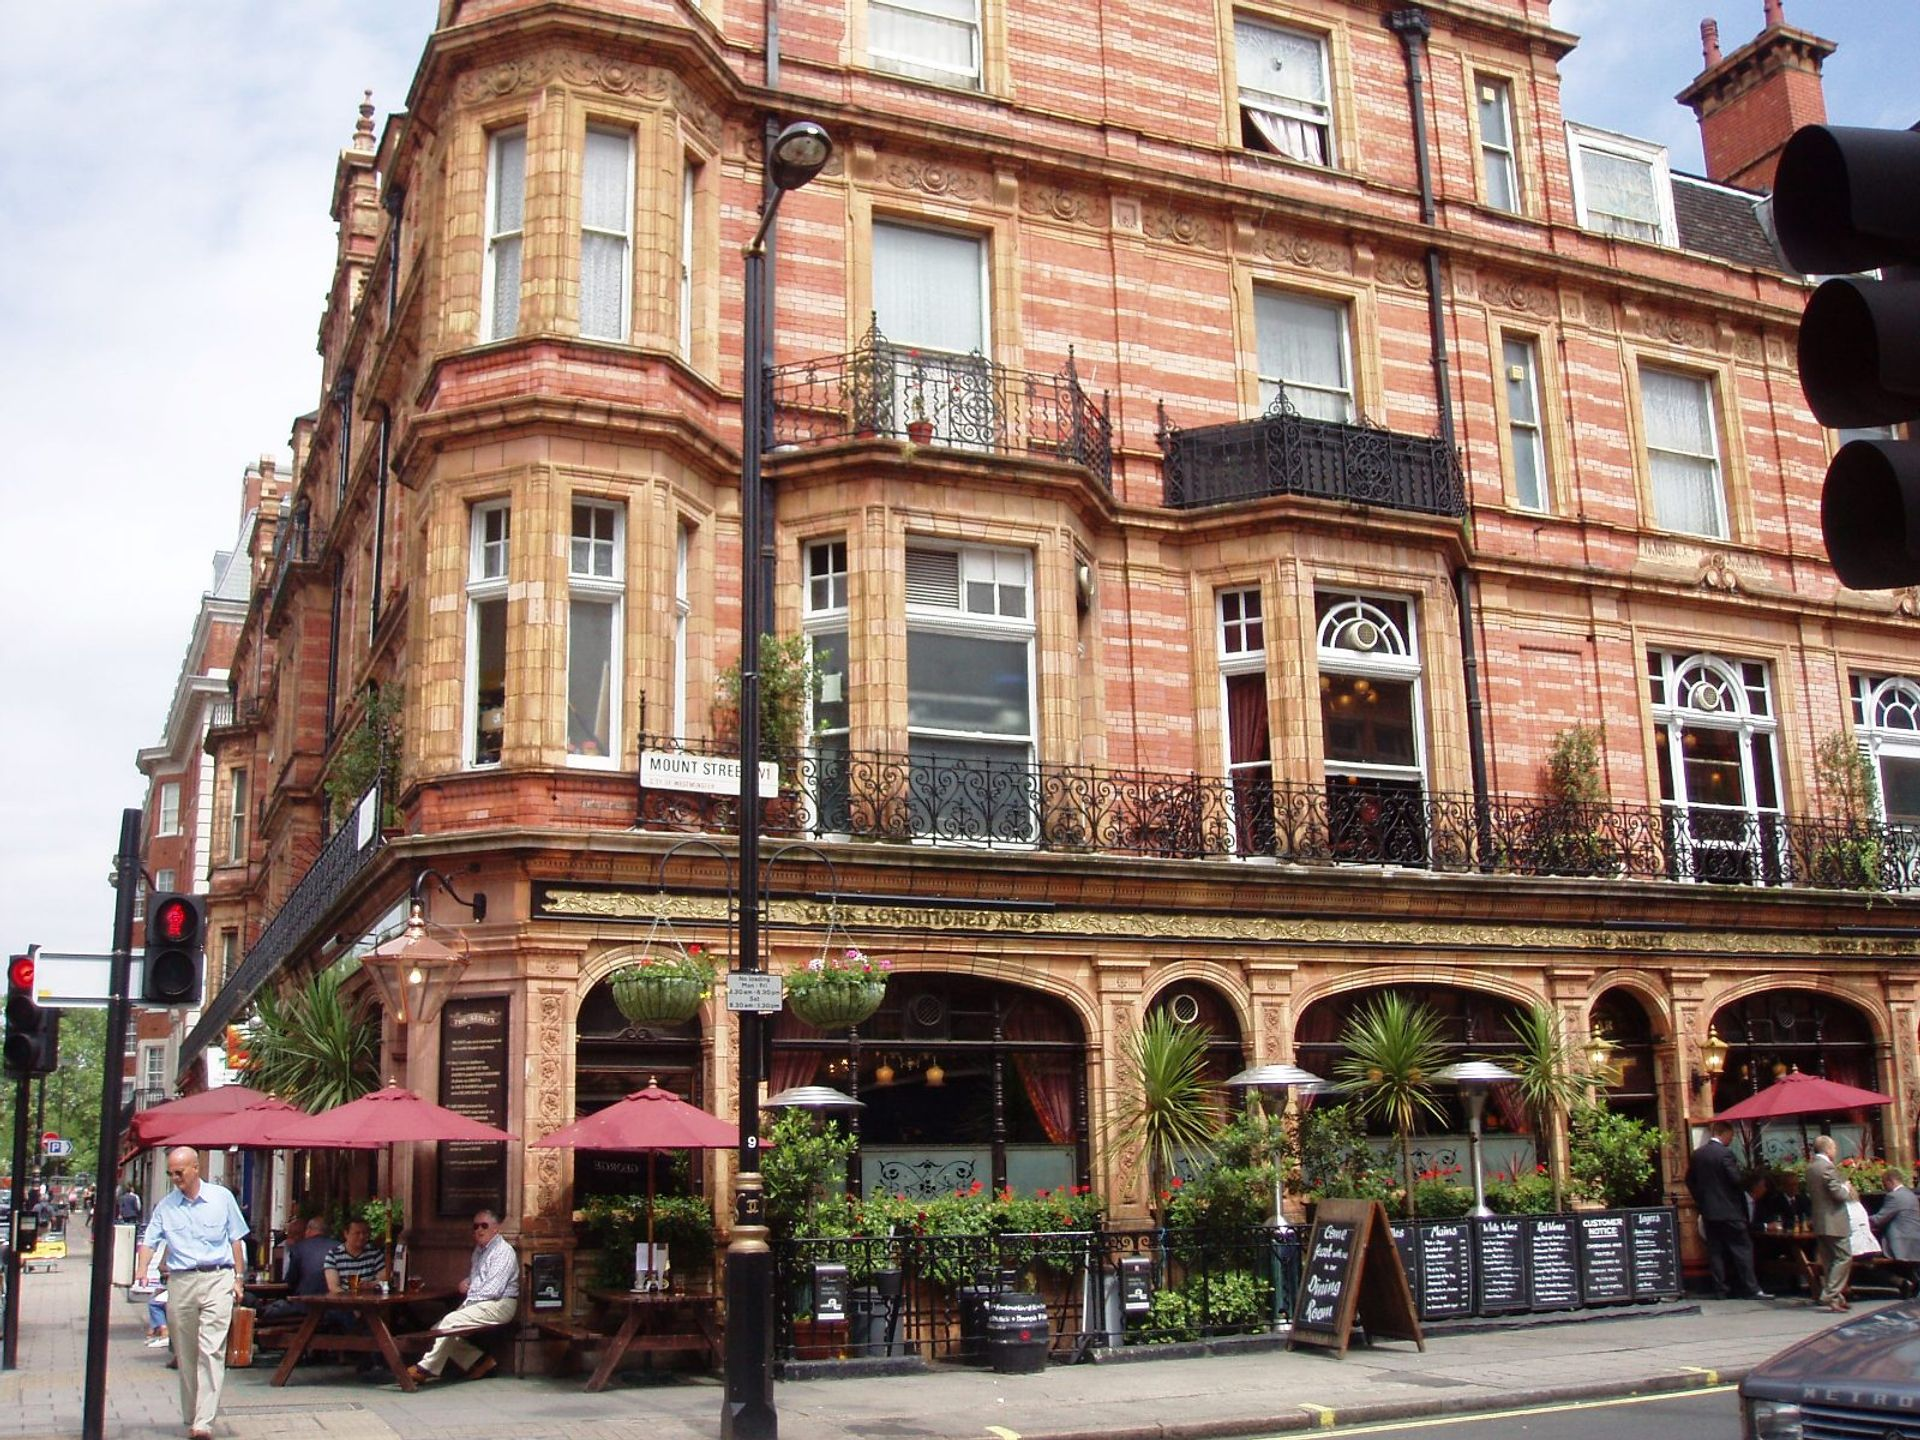 Mount Street in Mayfair, London Photo: Ewan Munro / Flickr